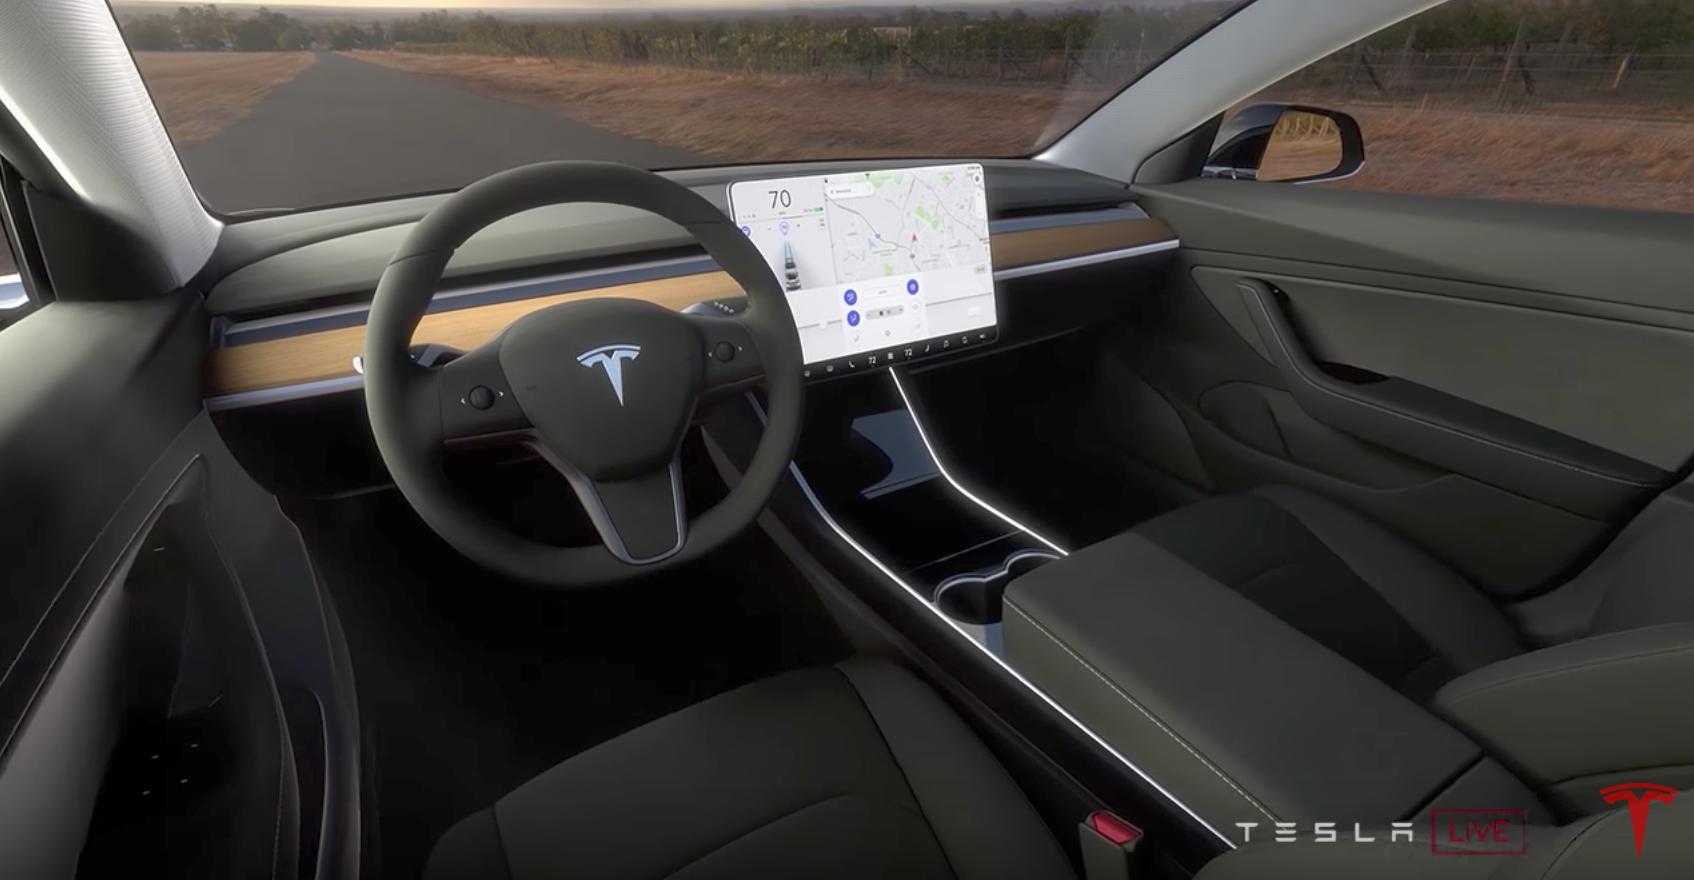 Tesla Model 3 To Crush BMW, Audi, Mercedes, Acura, Lexus